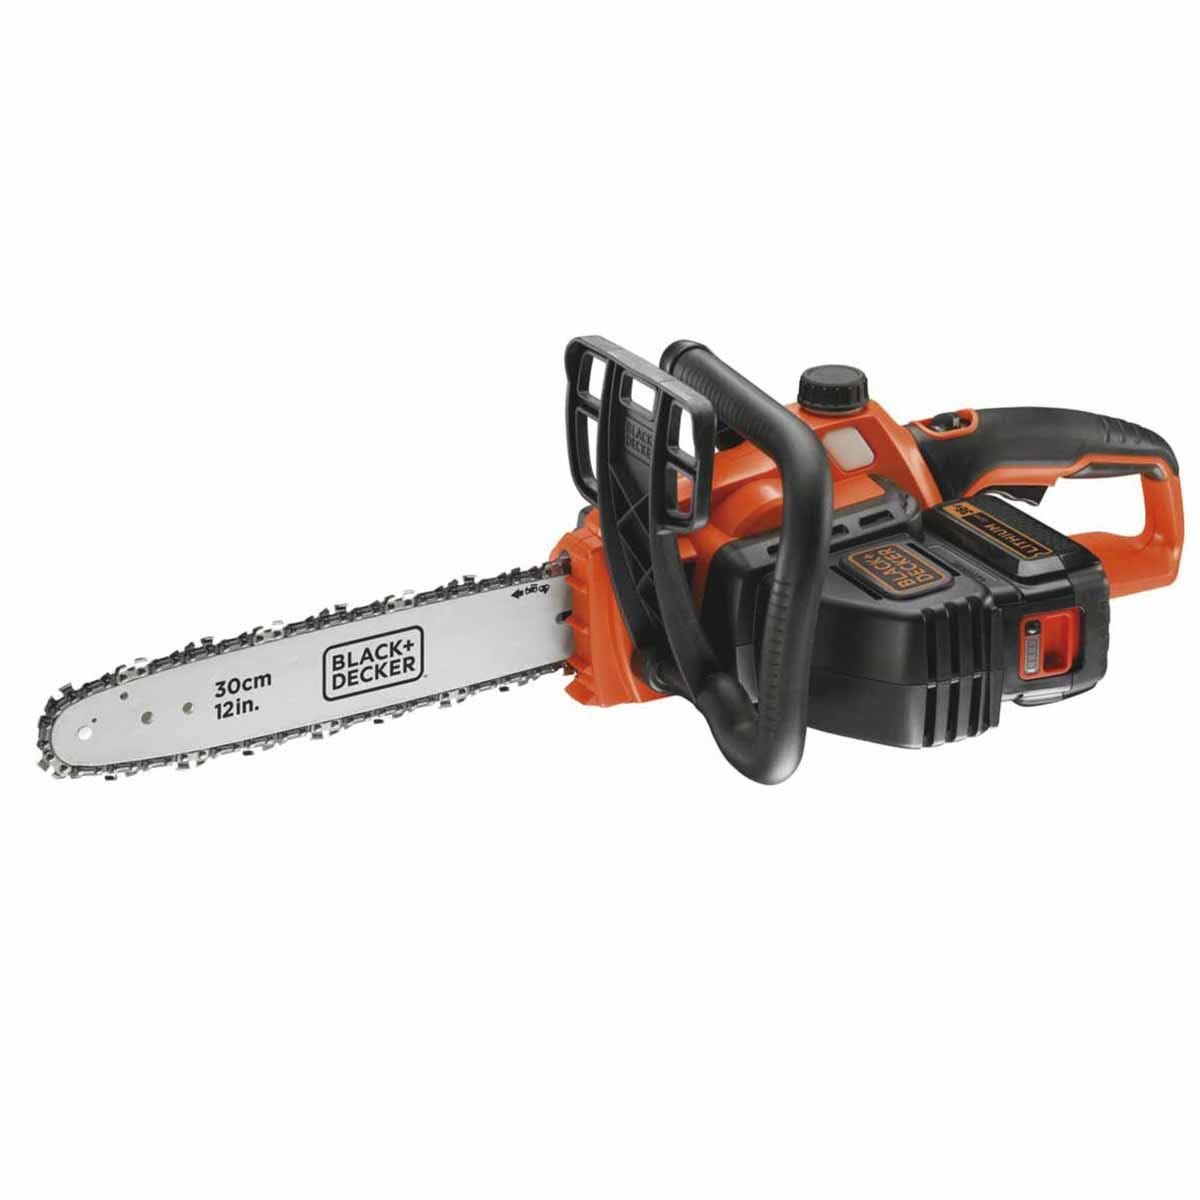 Black and Decker 36v Cordless 30cm Chainsaw